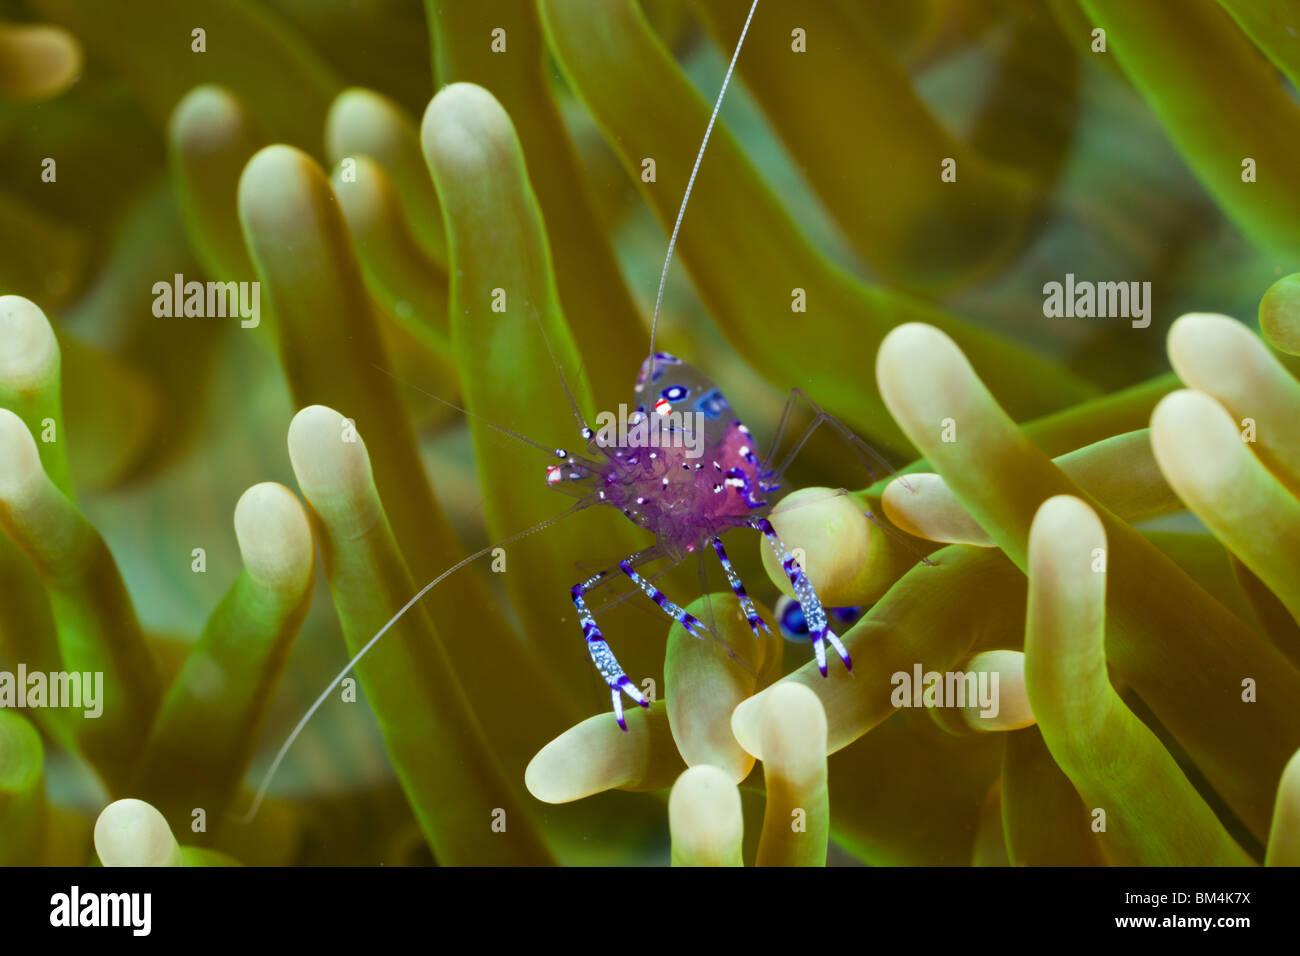 Anemone Comensal Shrimp, Periclimenes tosaensis, Raja Ampat, West Papua, Indonesia - Stock Image